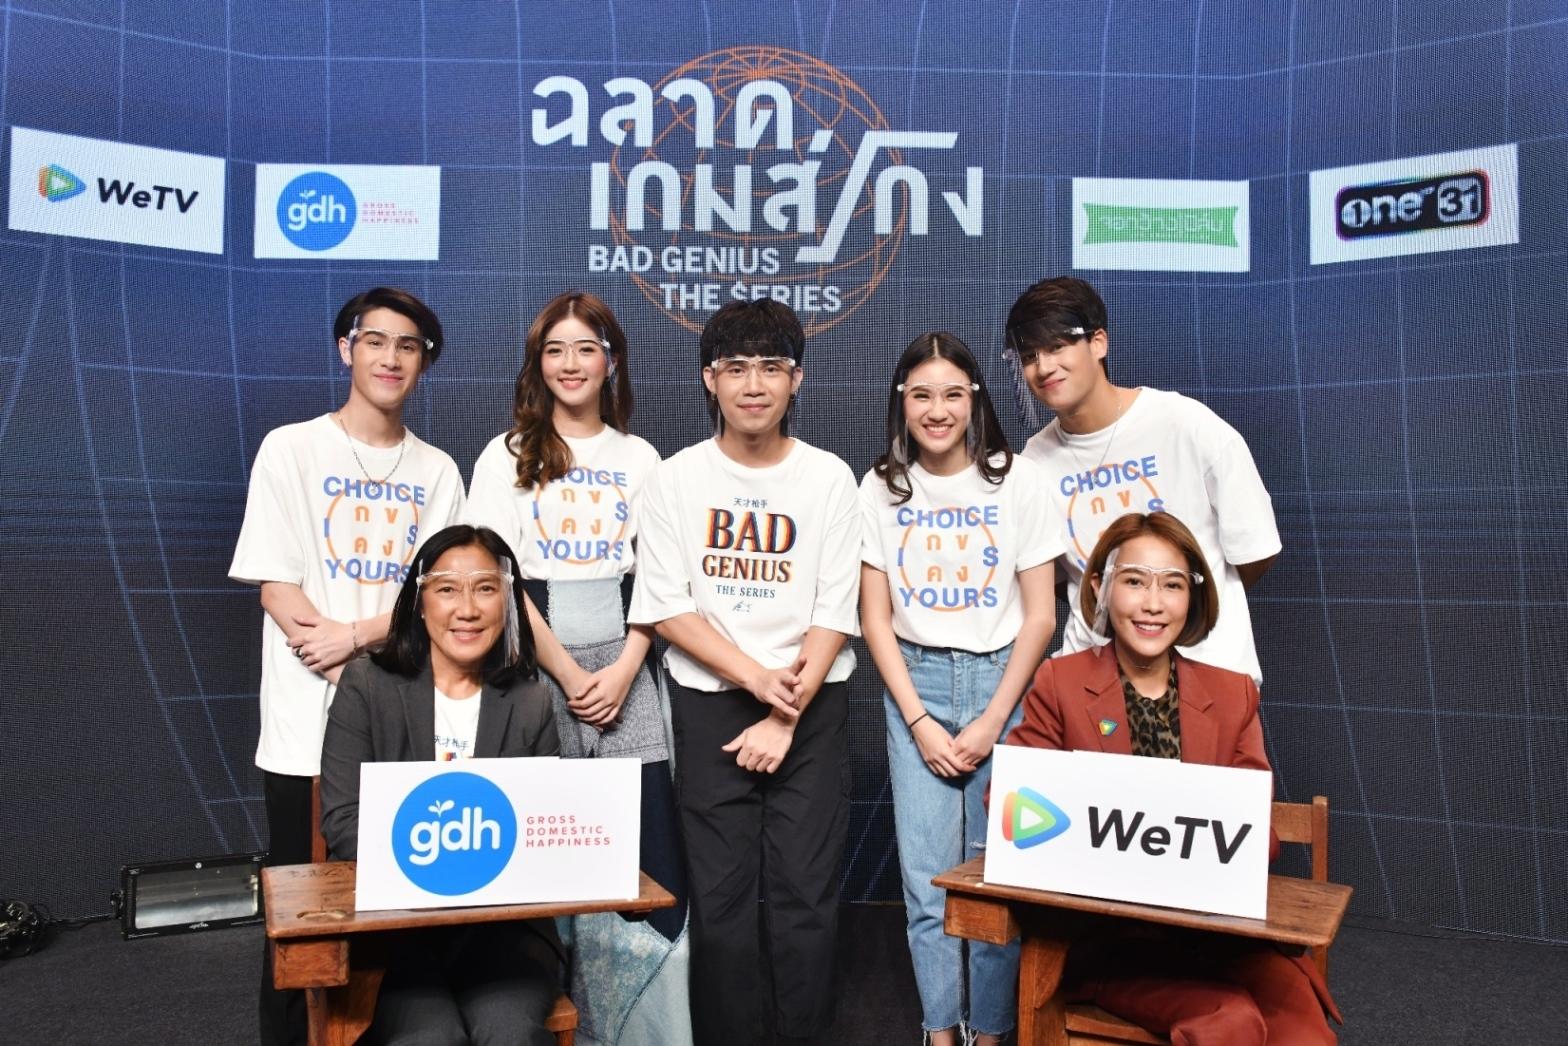 WeTV ตอกย้ำพันธกิจ ส่งแฟลกชิพคอนเทนต์สัญชาติไทย Bad Genius The Series สร้างชื่อในตลาดต่างประเทศ